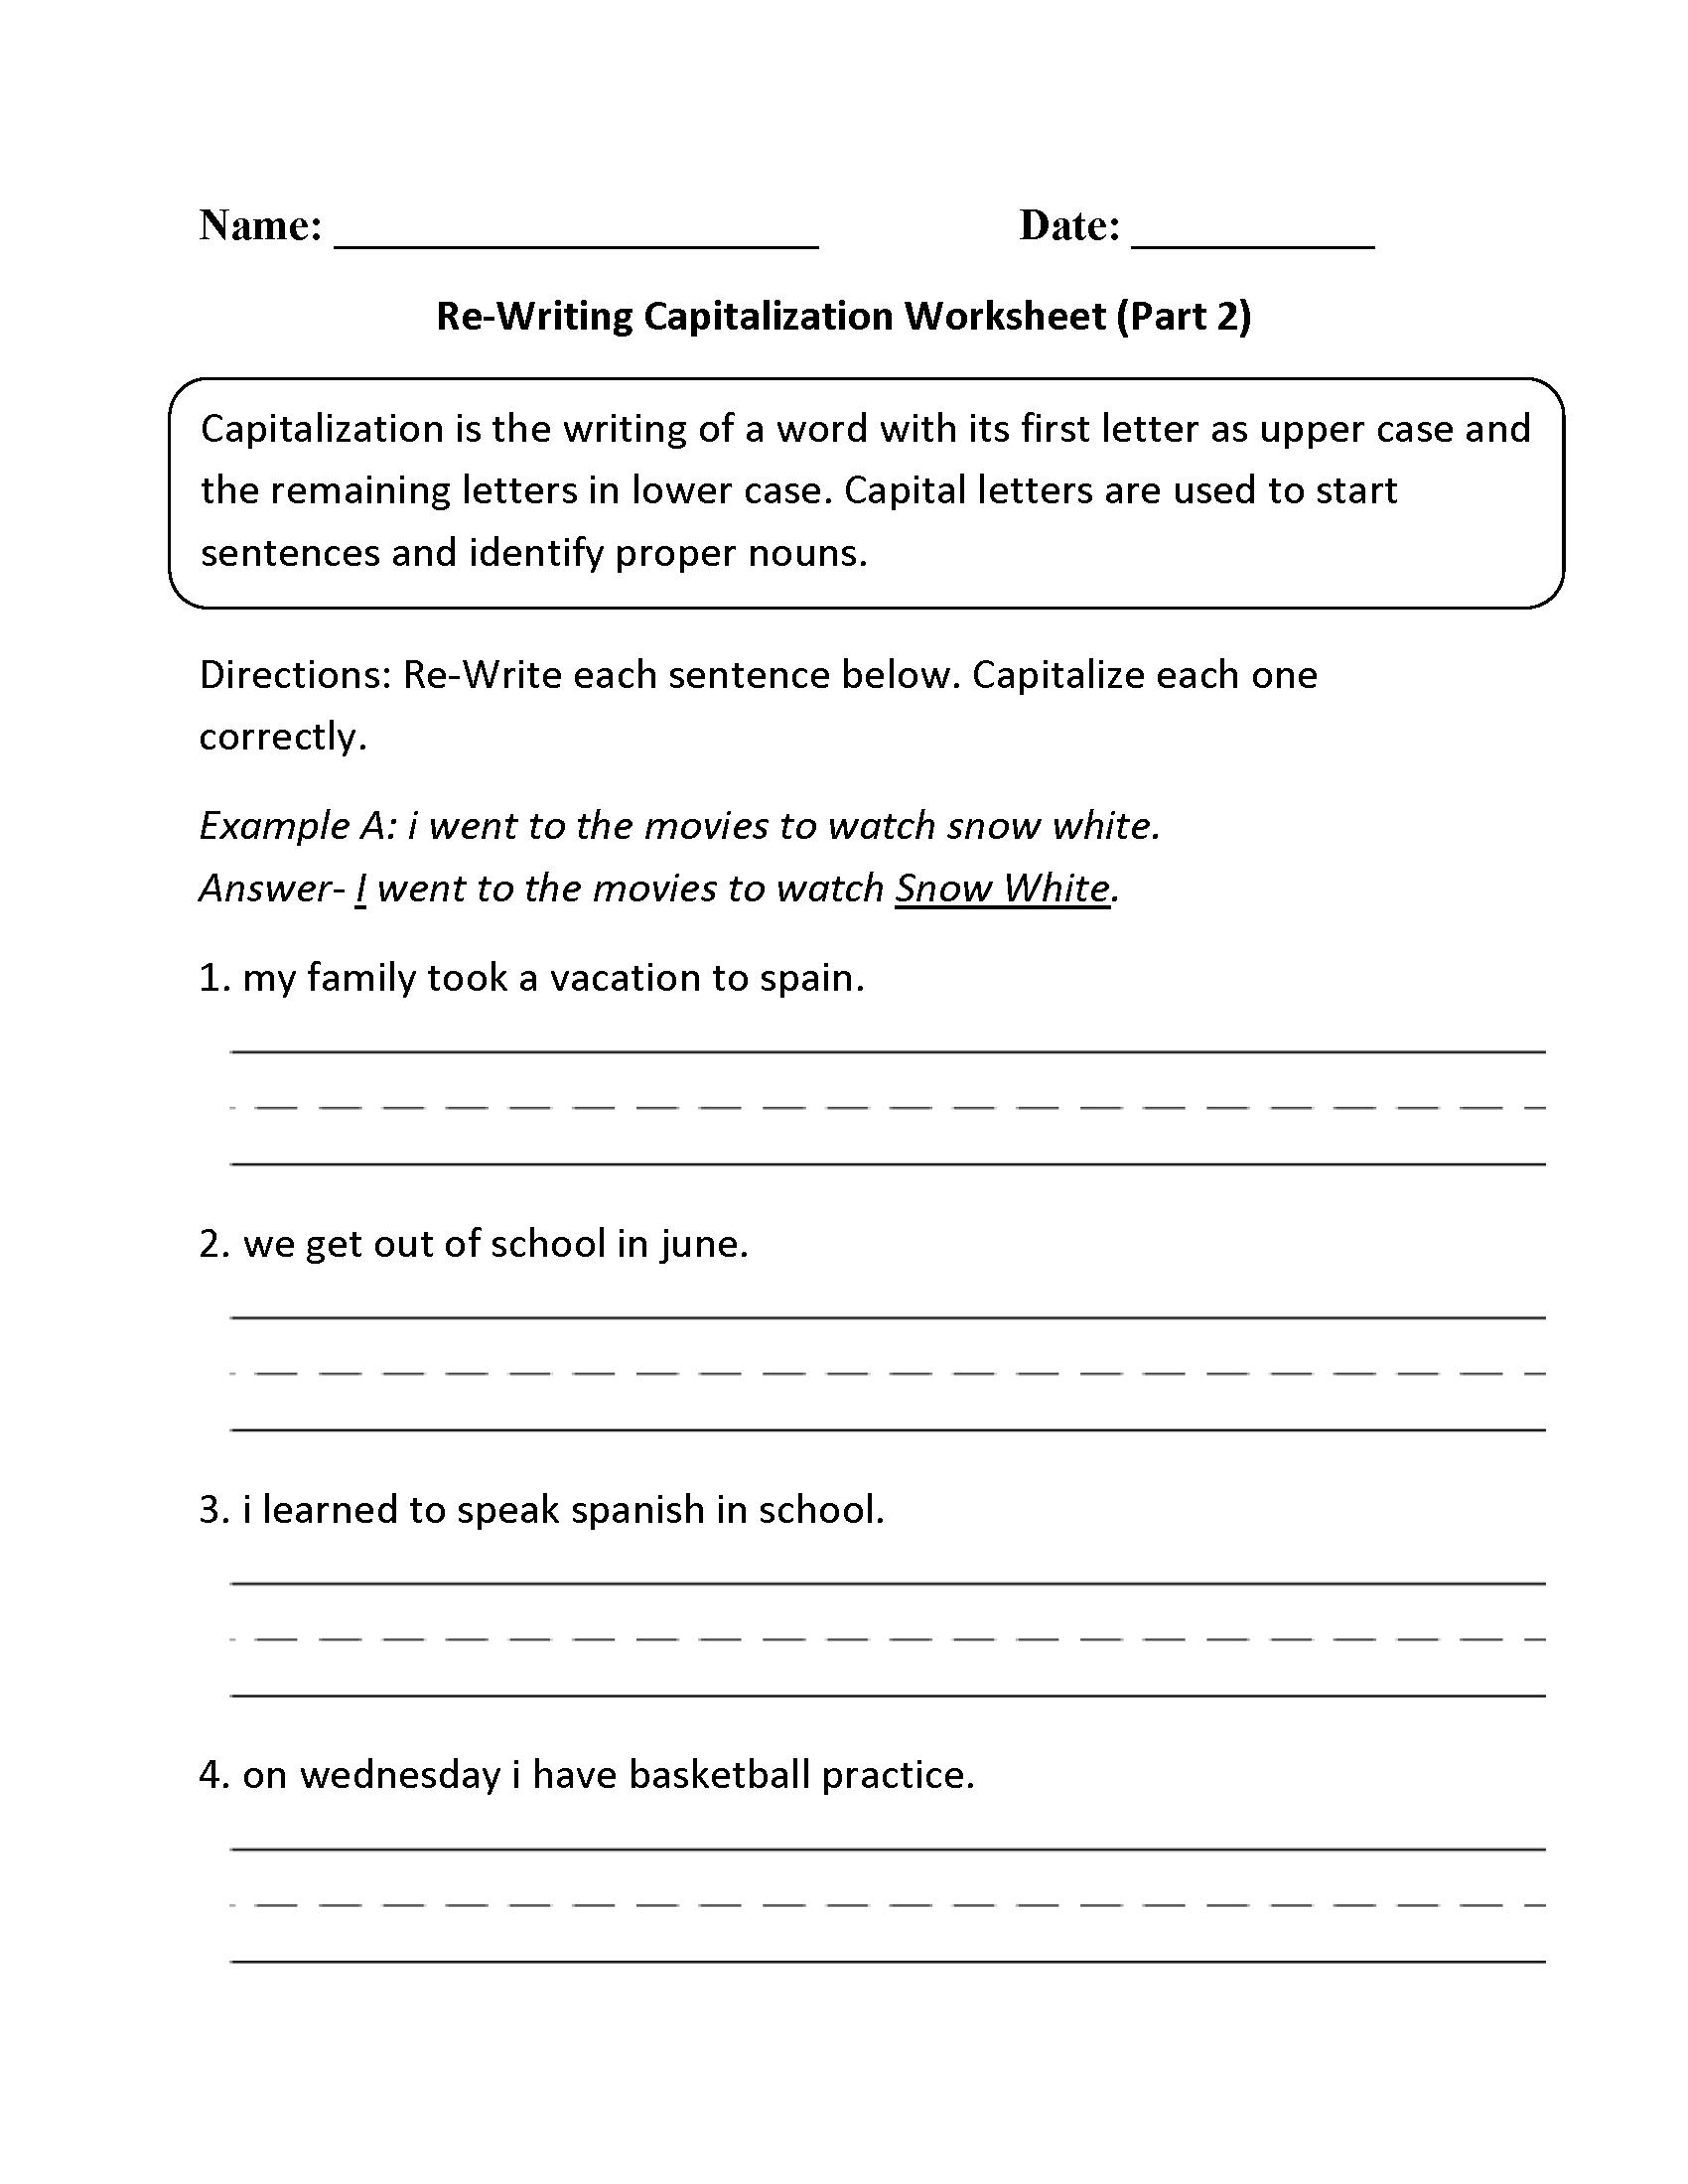 Re Writing Capitalization Worksheet Part 2 Capitalization Worksheets Paragraph Writing Worksheets Writing Practice Worksheets [ 2200 x 1700 Pixel ]